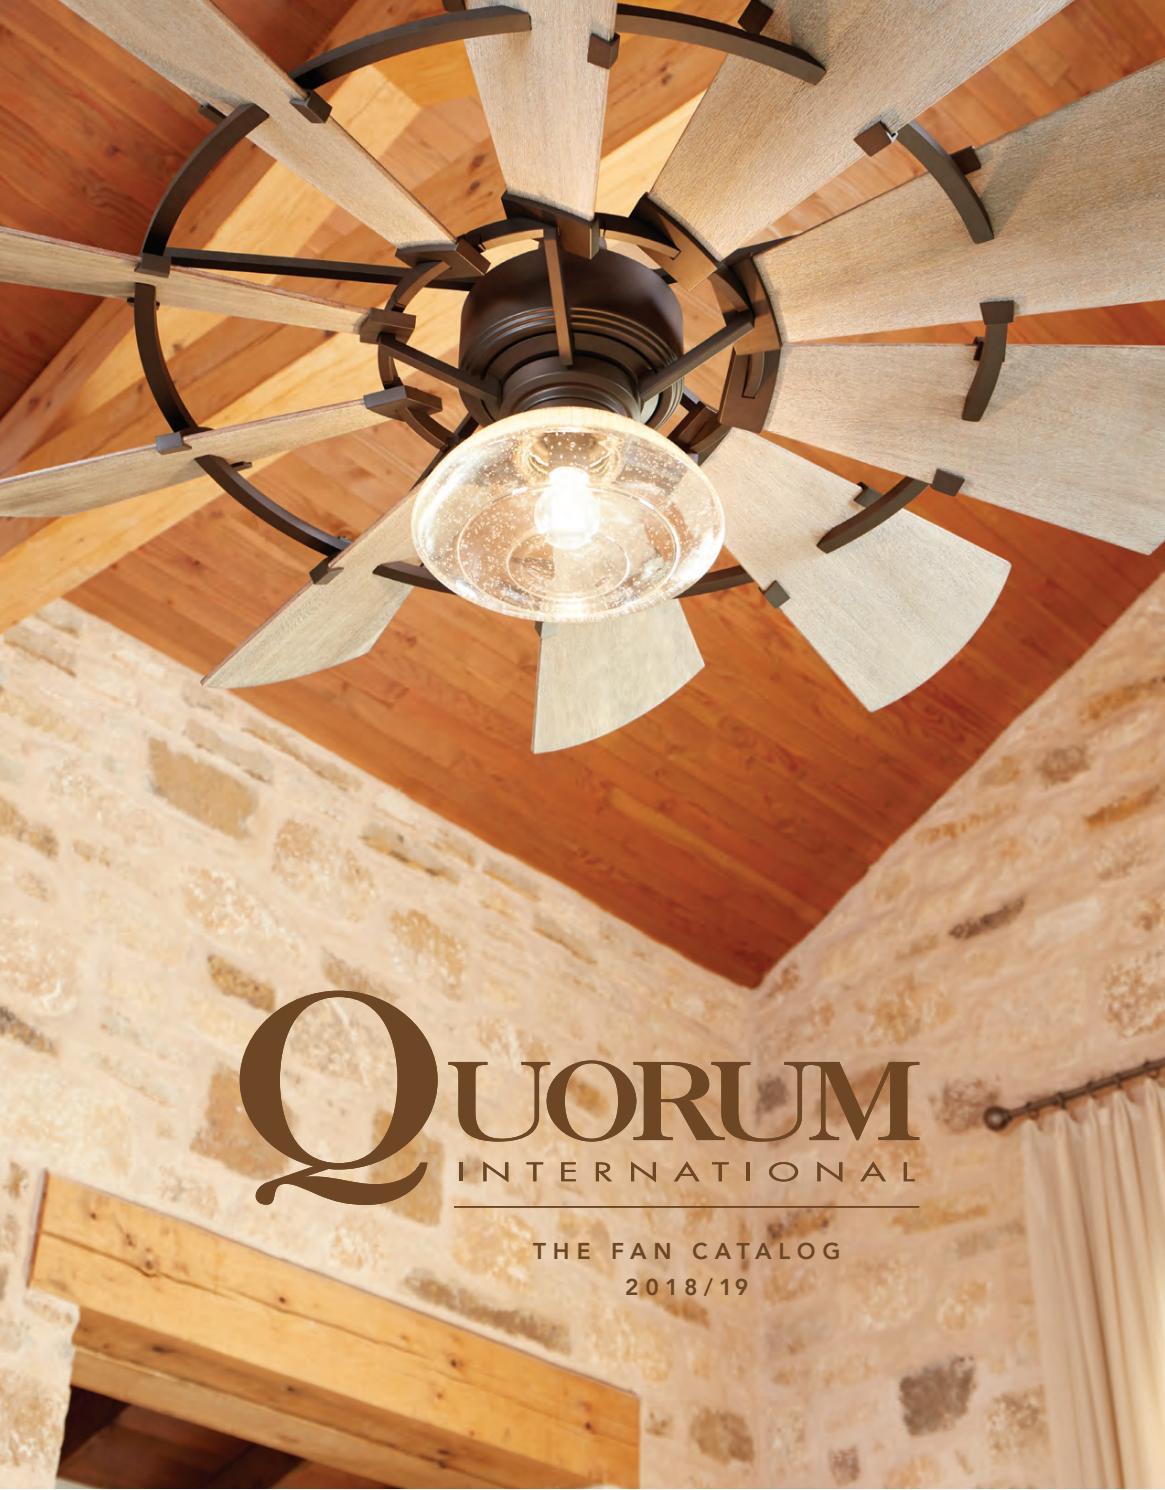 Quorum International 92413 Nickel Veranda 4 Blade Wall Mount Patio Fan